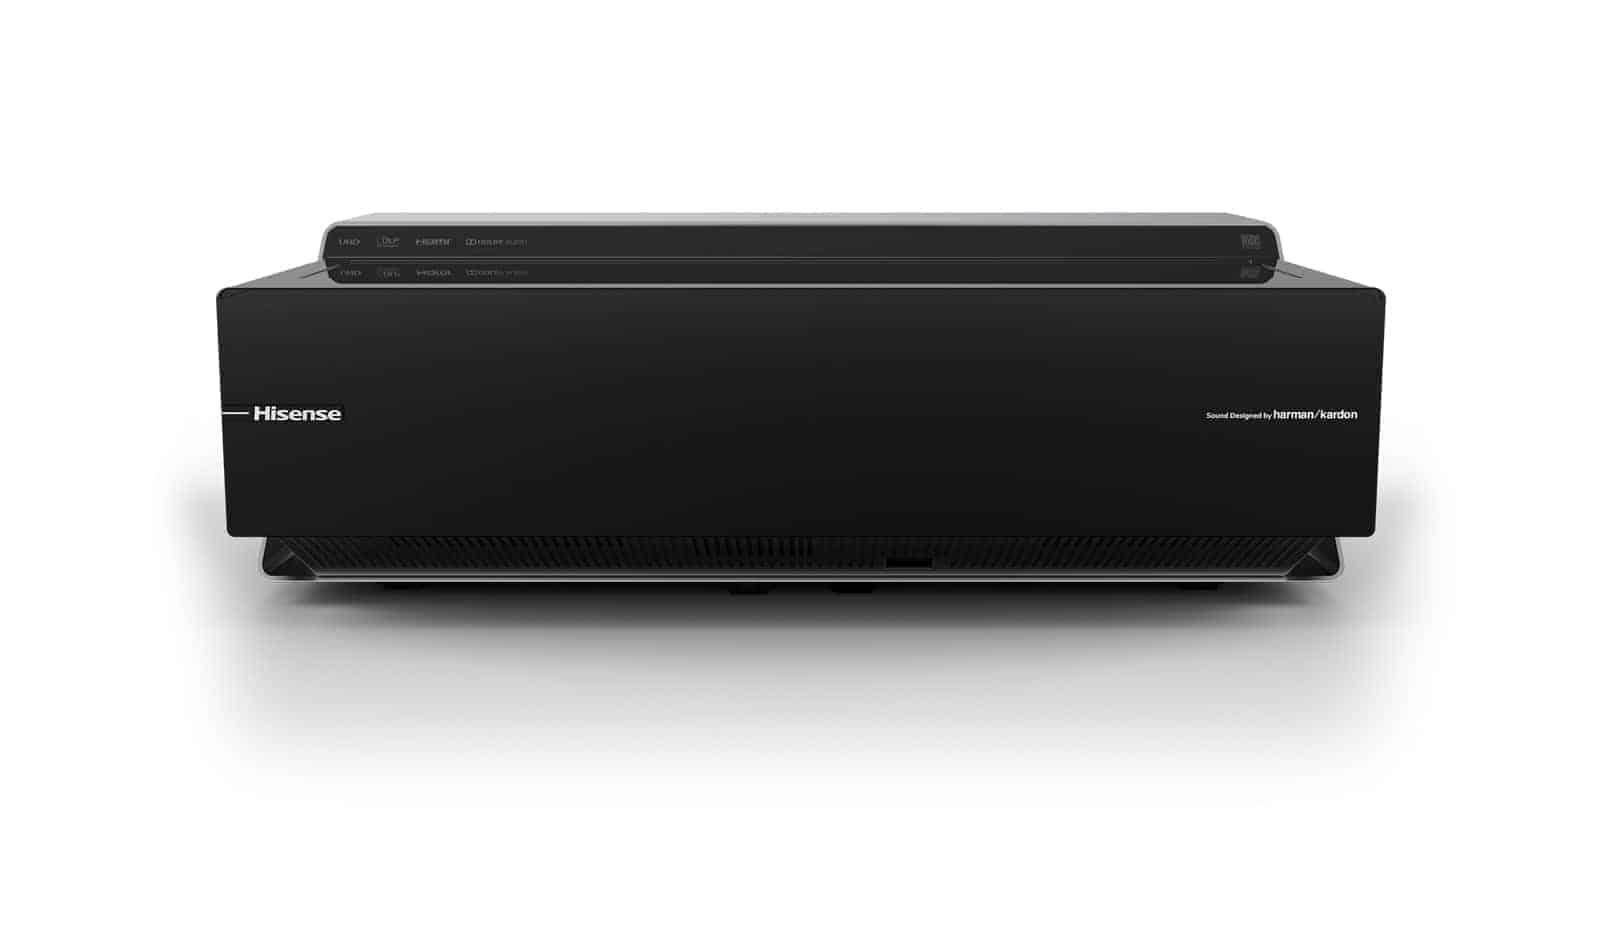 Hisense 4K UHD Laser TV Projector 1